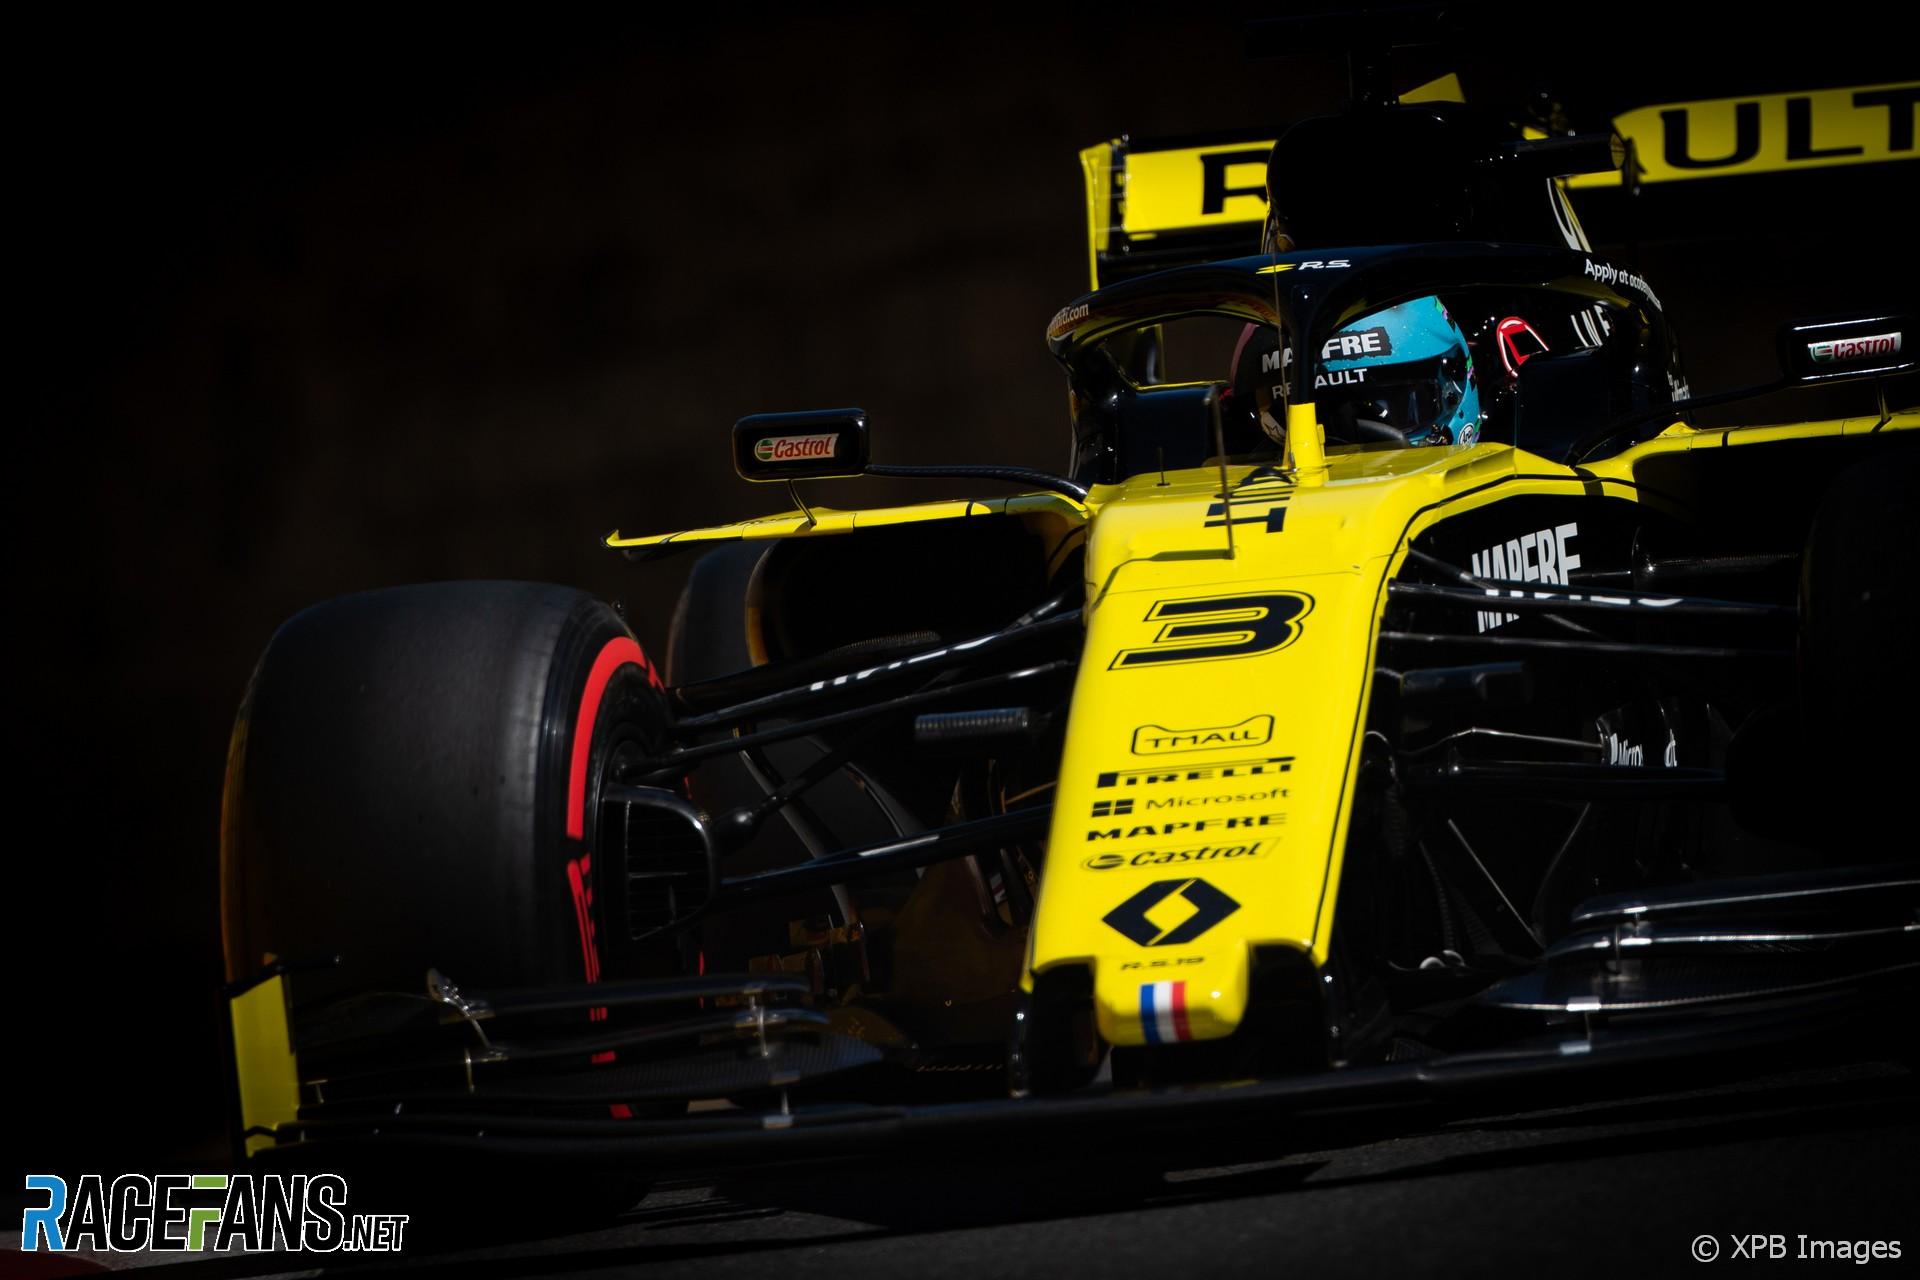 Daniel Ricciardo, Renault, Baku City Circuit, 2019